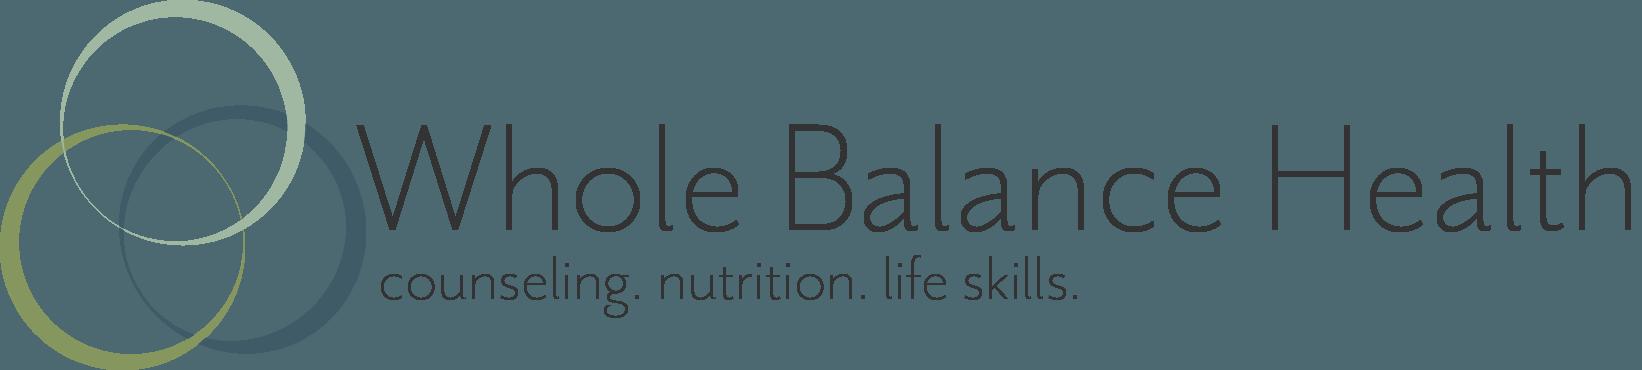 Whole Balance Health